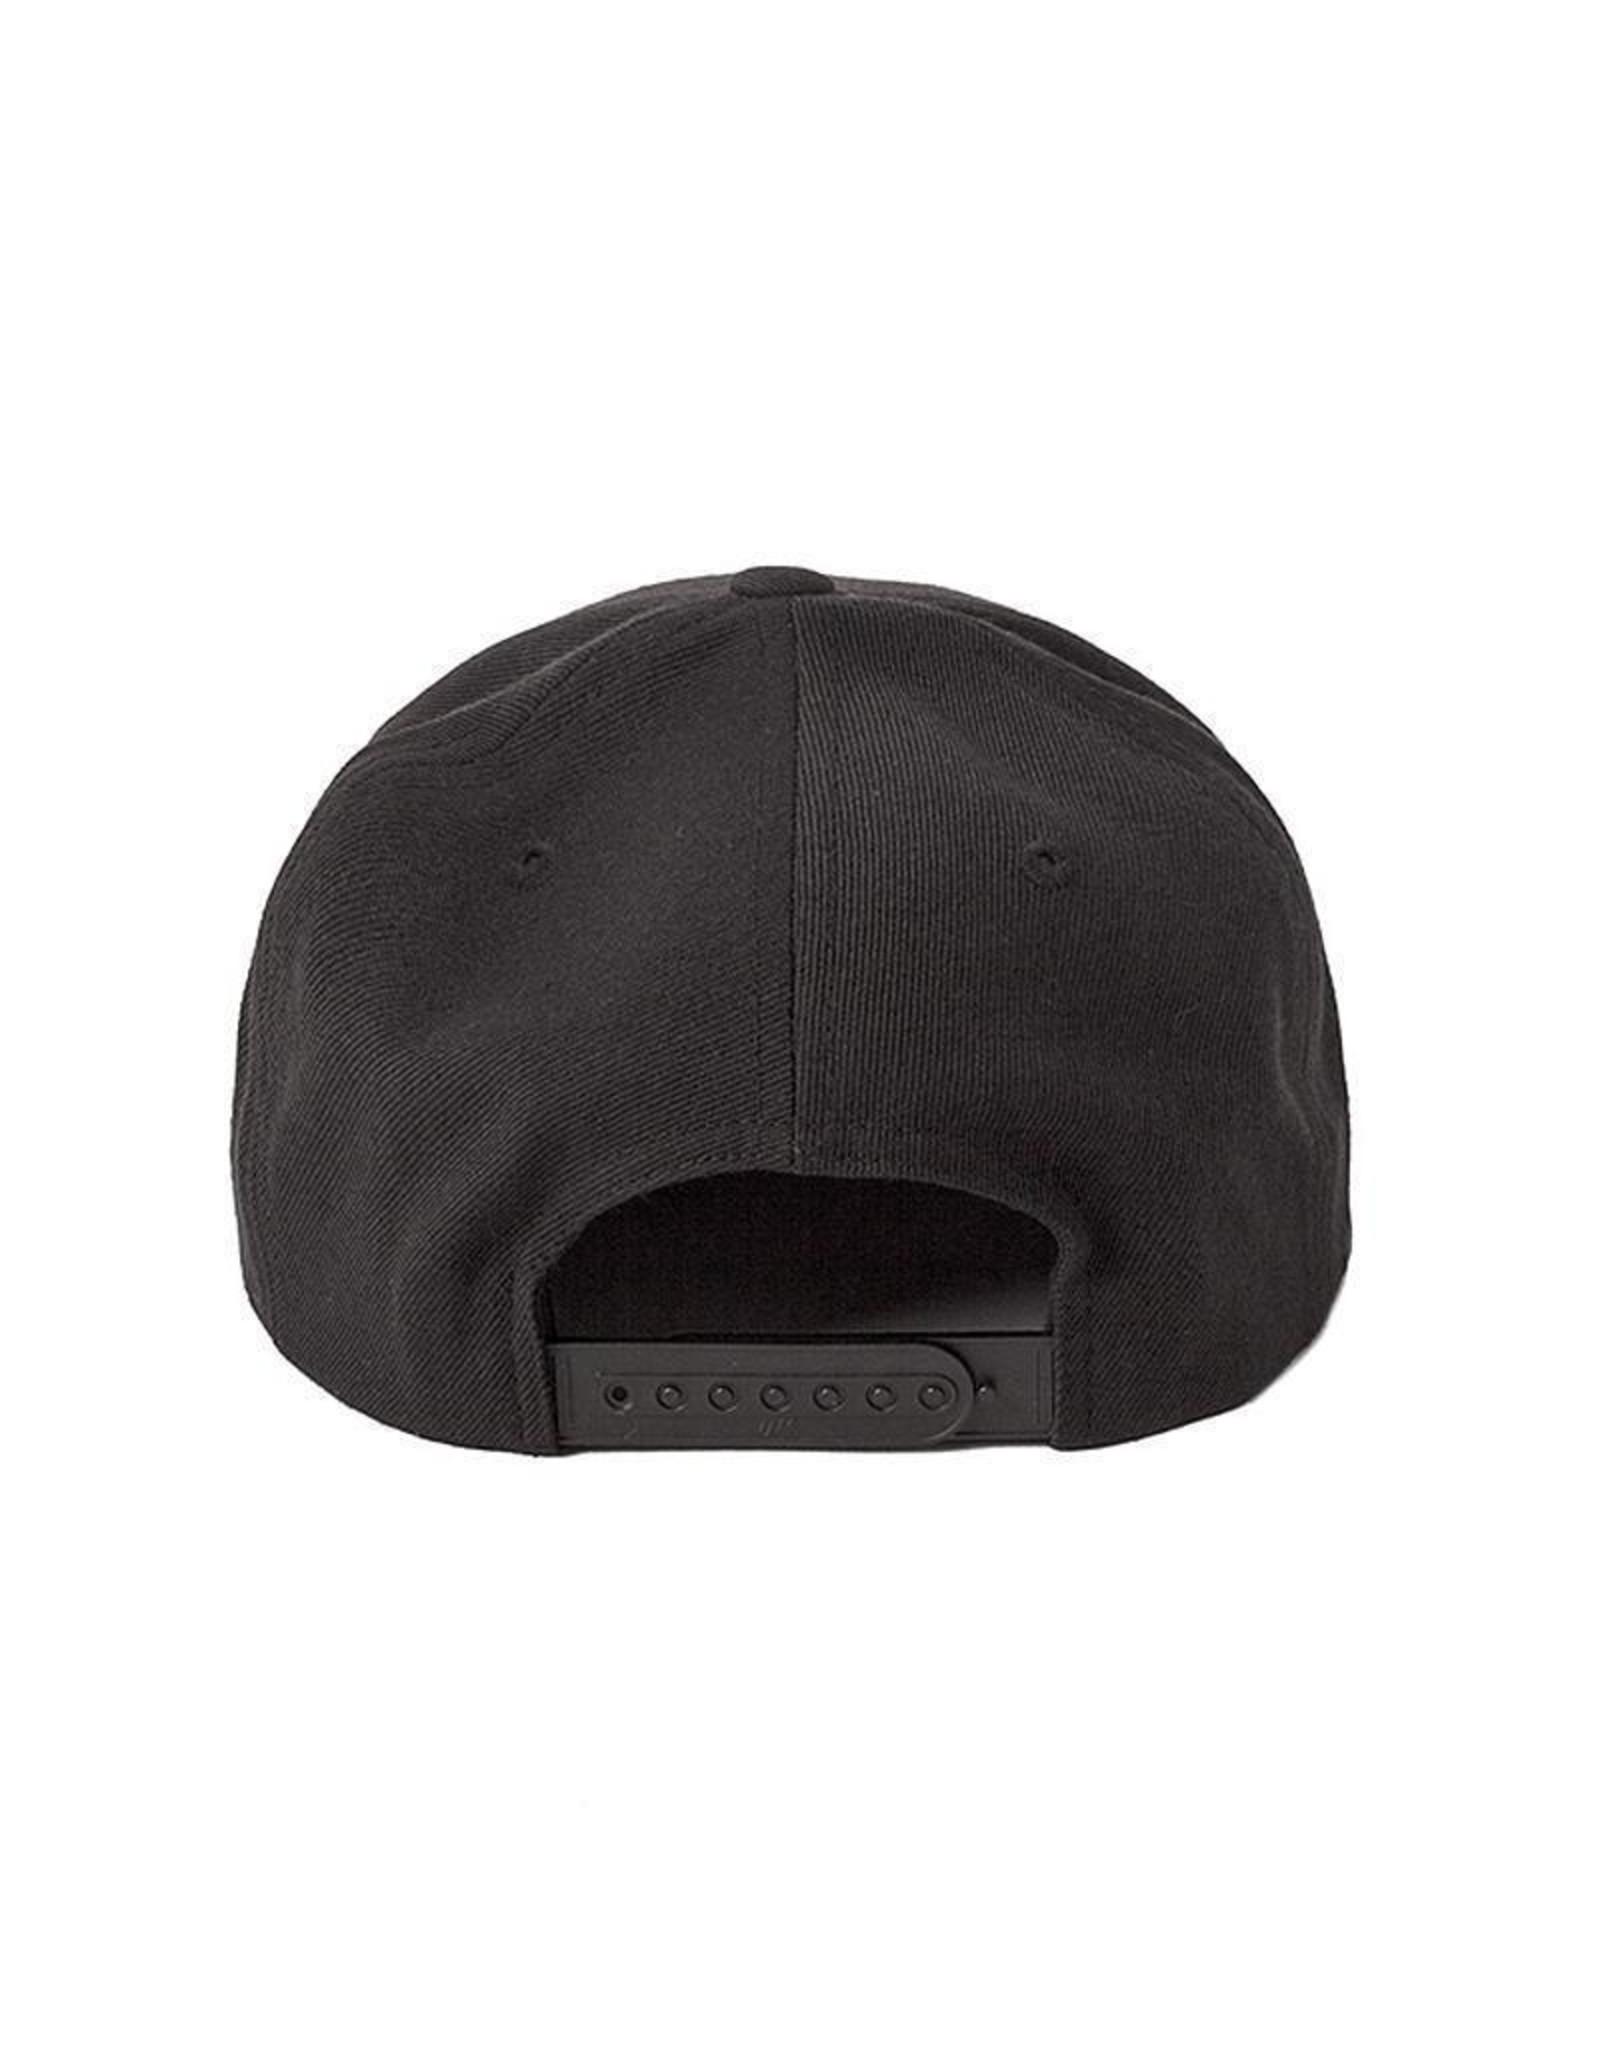 Nasty Pig Nasty Pig Ever Nasty Flatbrim Hat